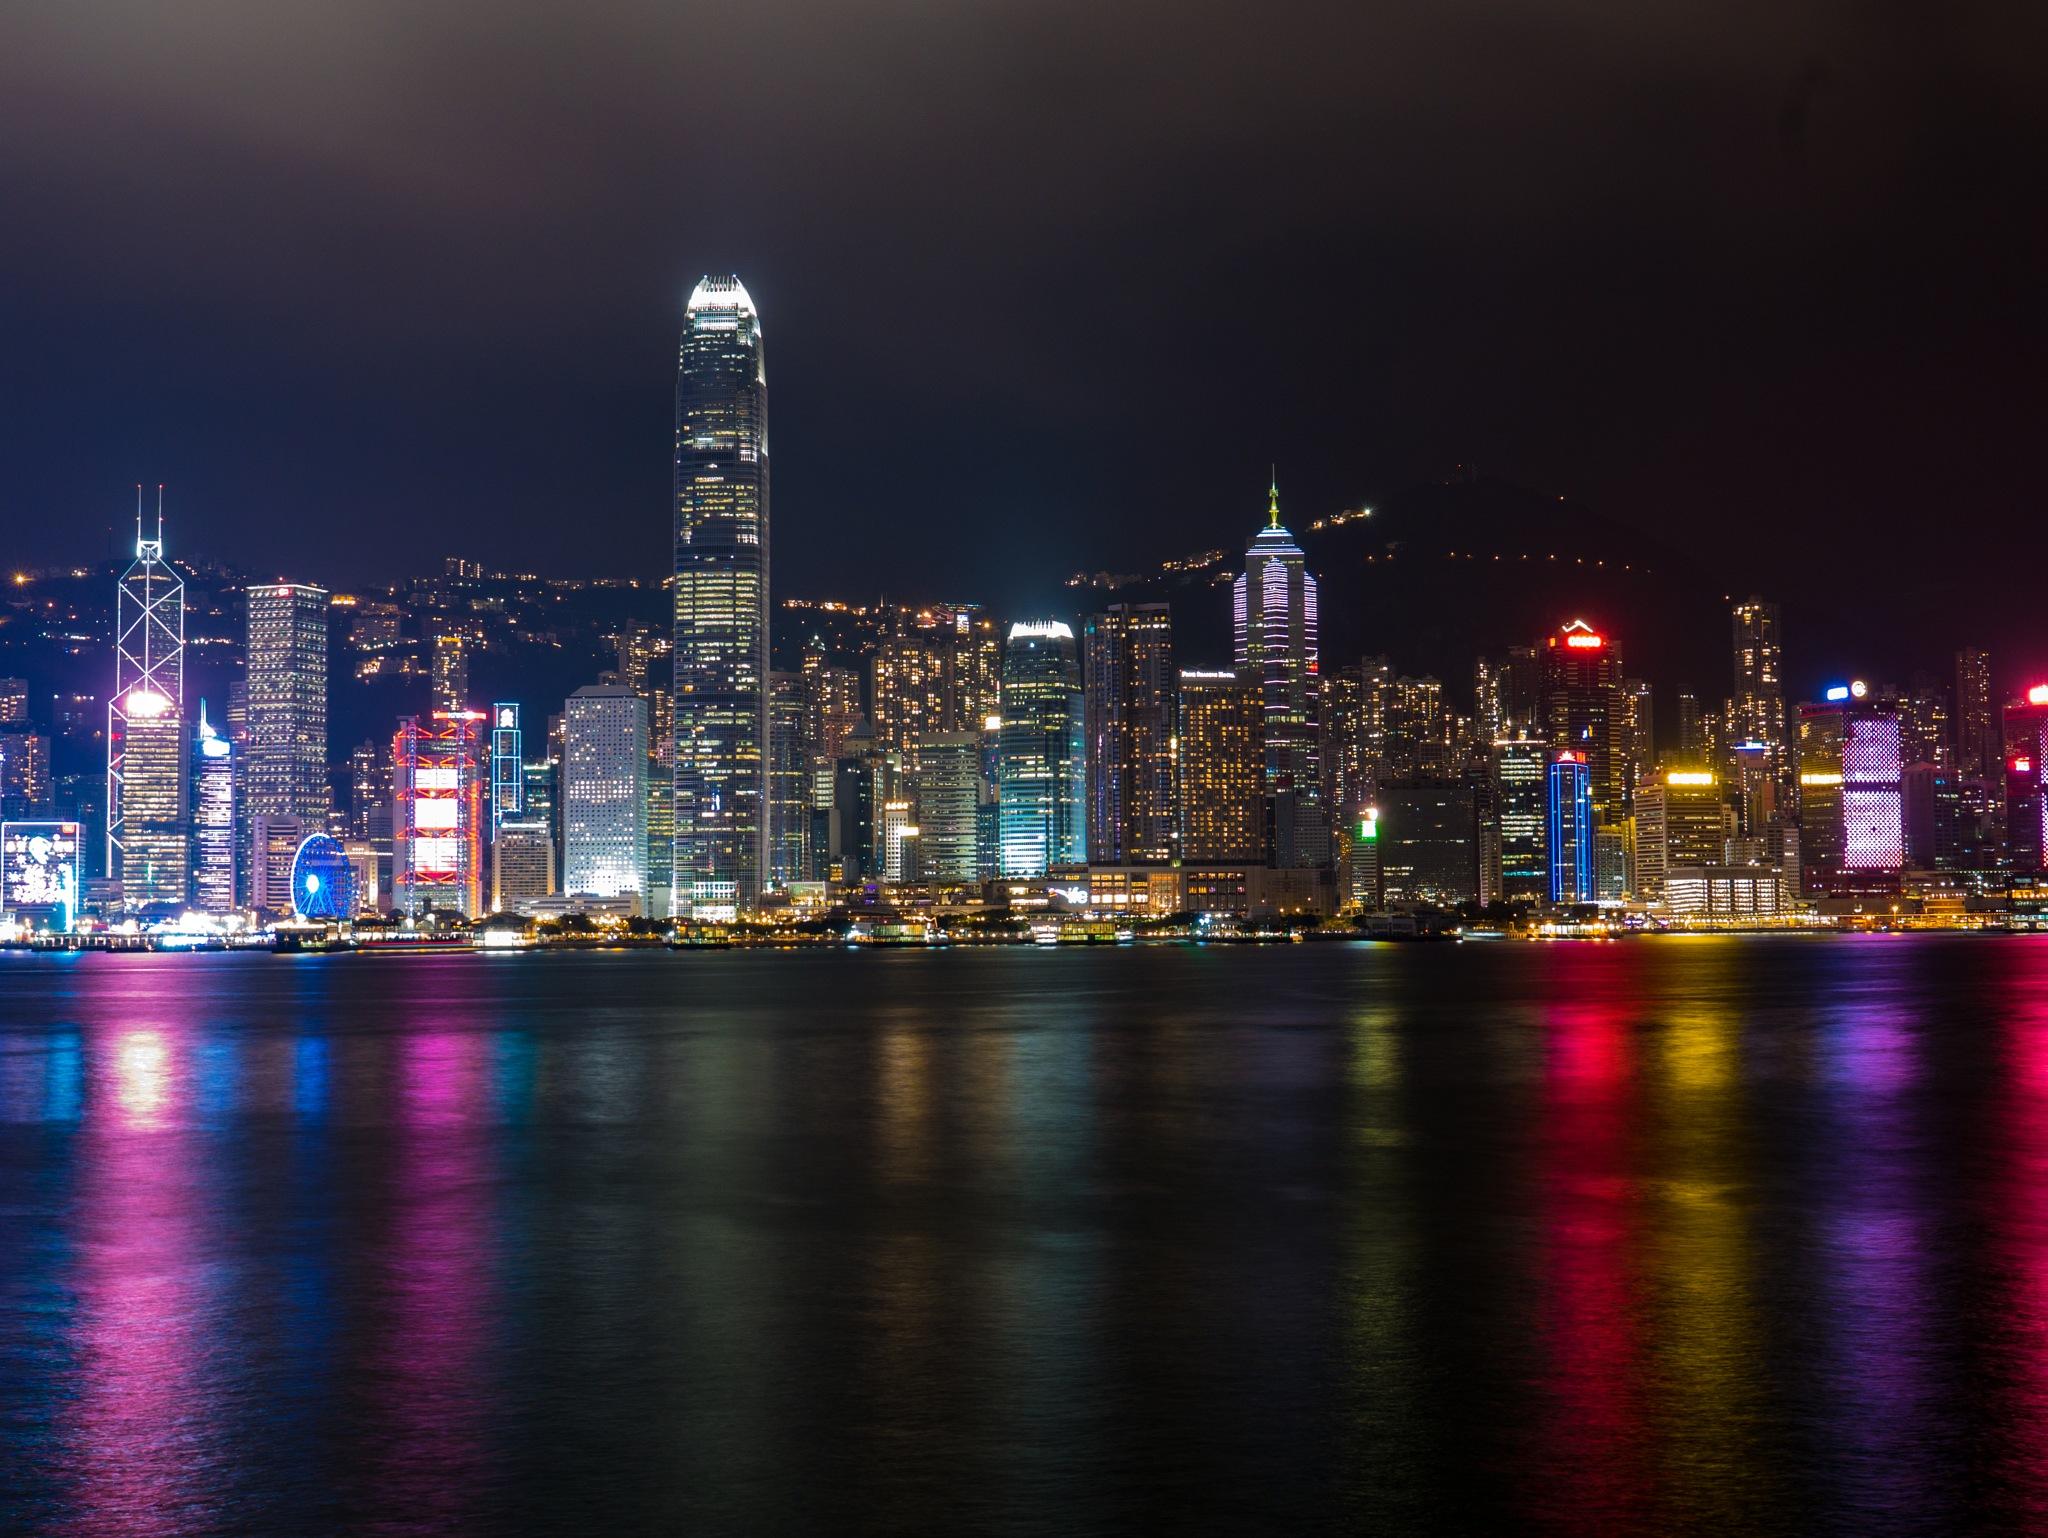 A view of Central Disyrict, Victoria Bay, Hong Kong by nobu_24